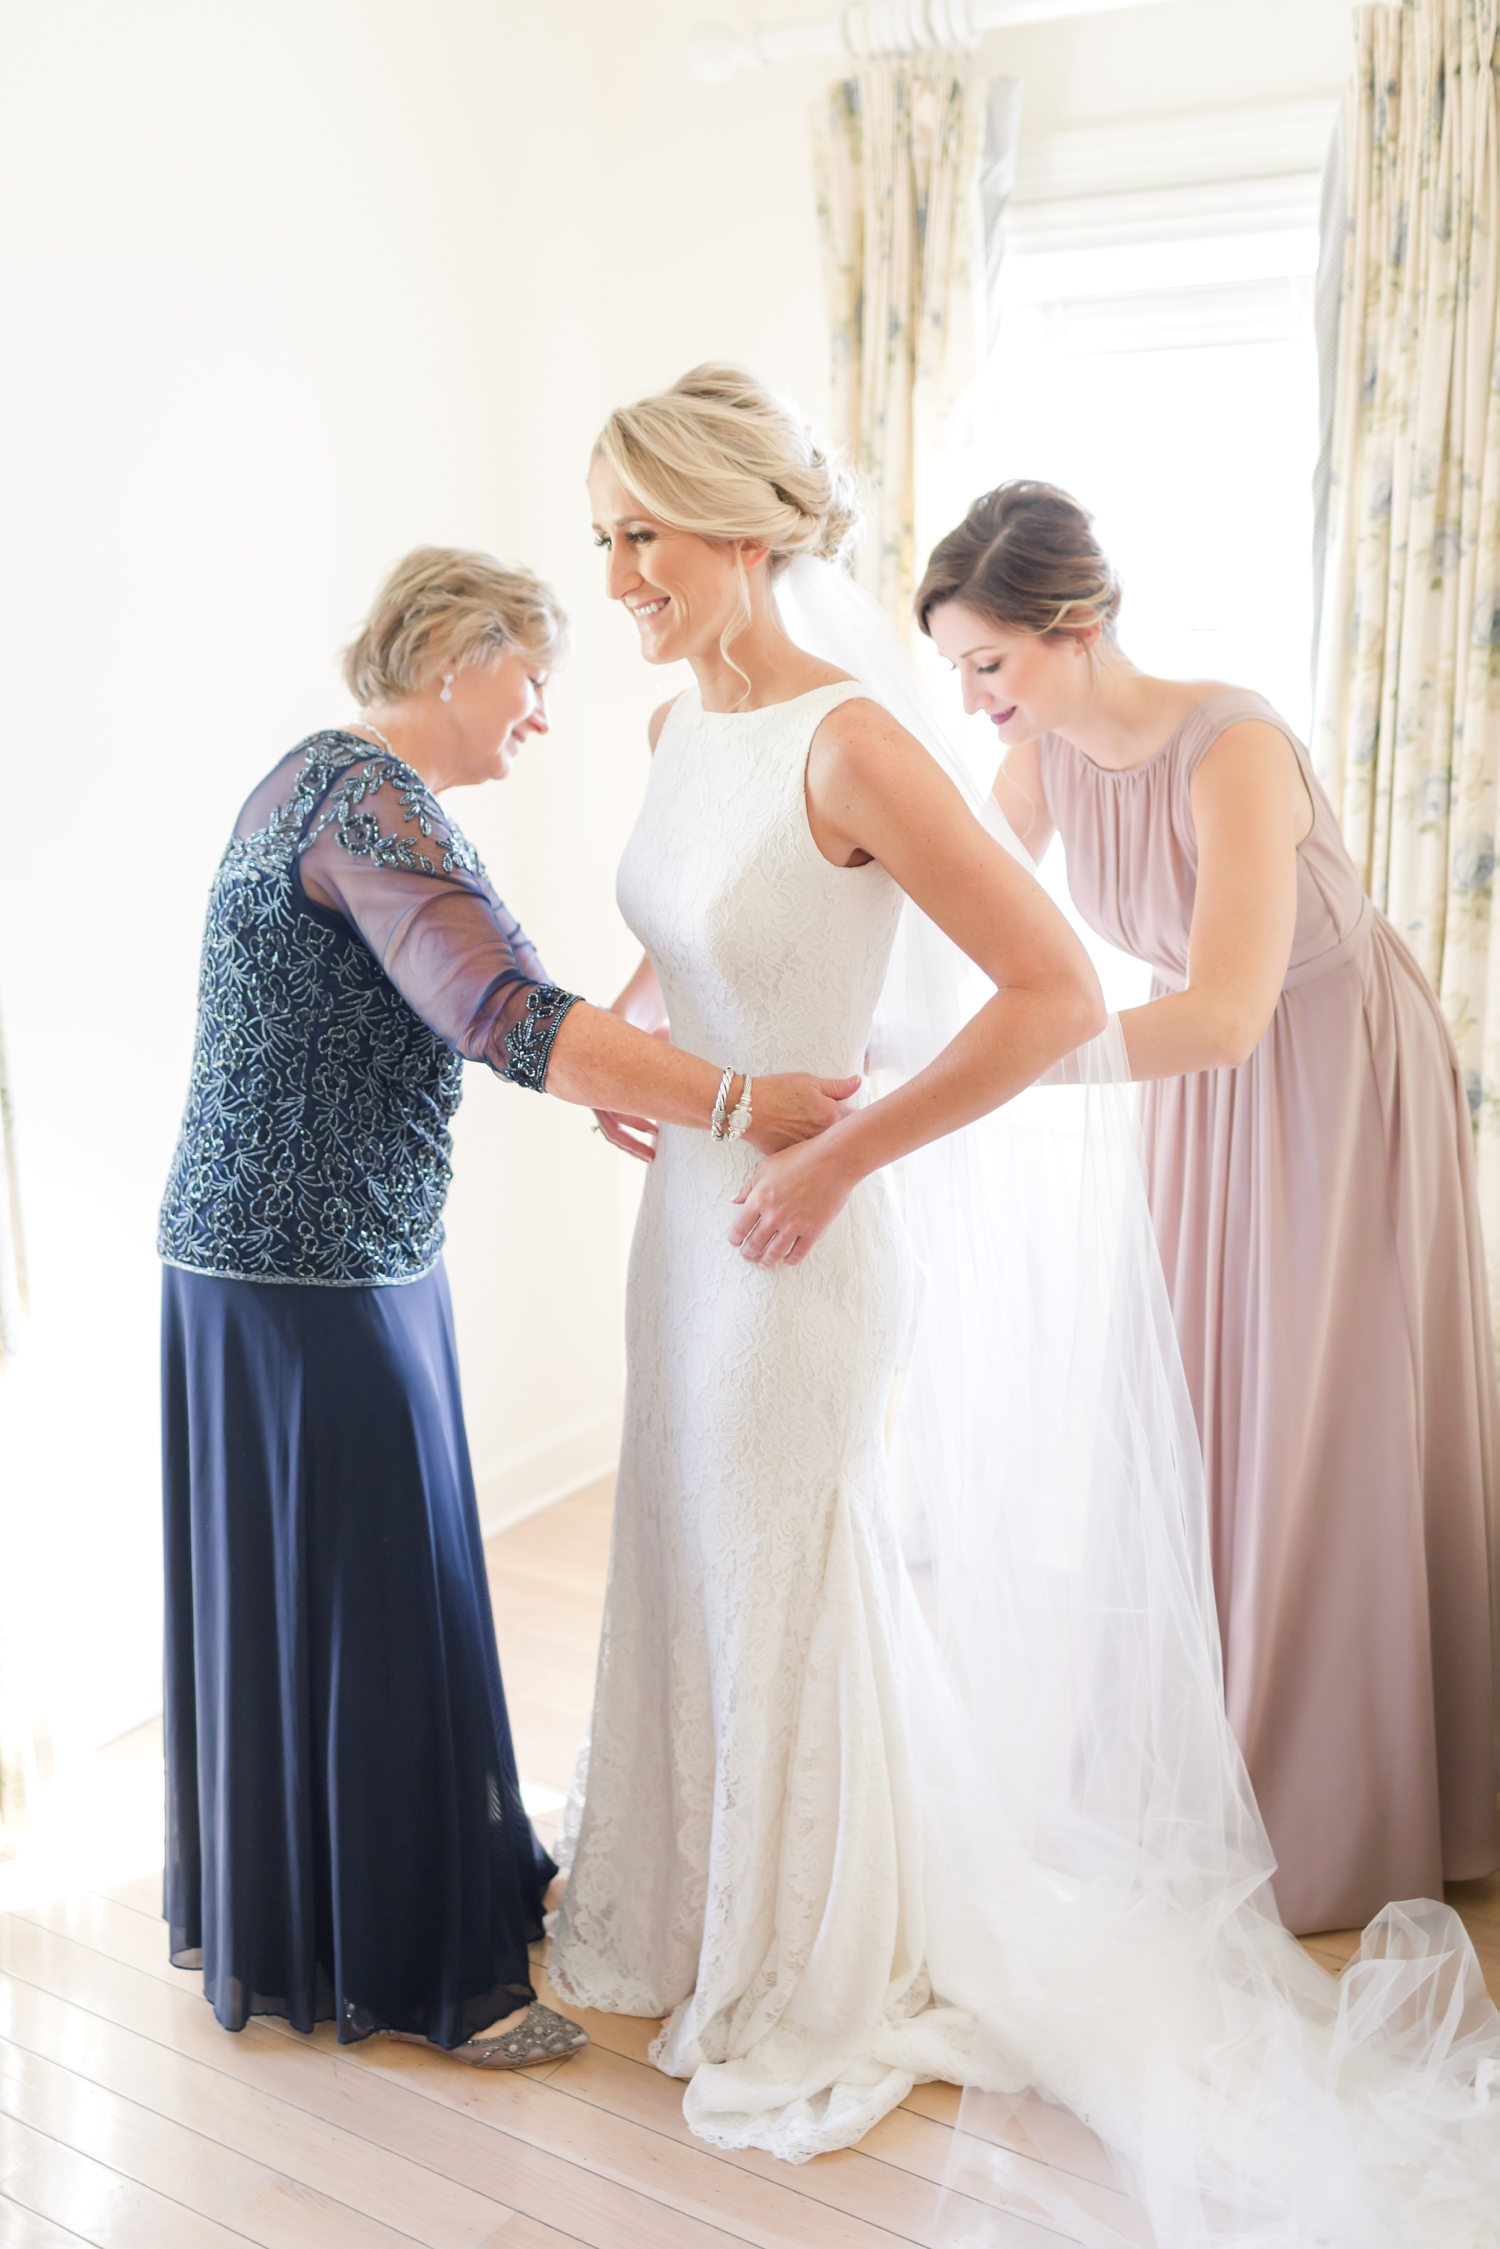 Wojciechowski Wedding-115_the-oaks-waterfront-inn-wedding-easton-maryland-wedding-photography-anna-grace-photography-photo.jpg